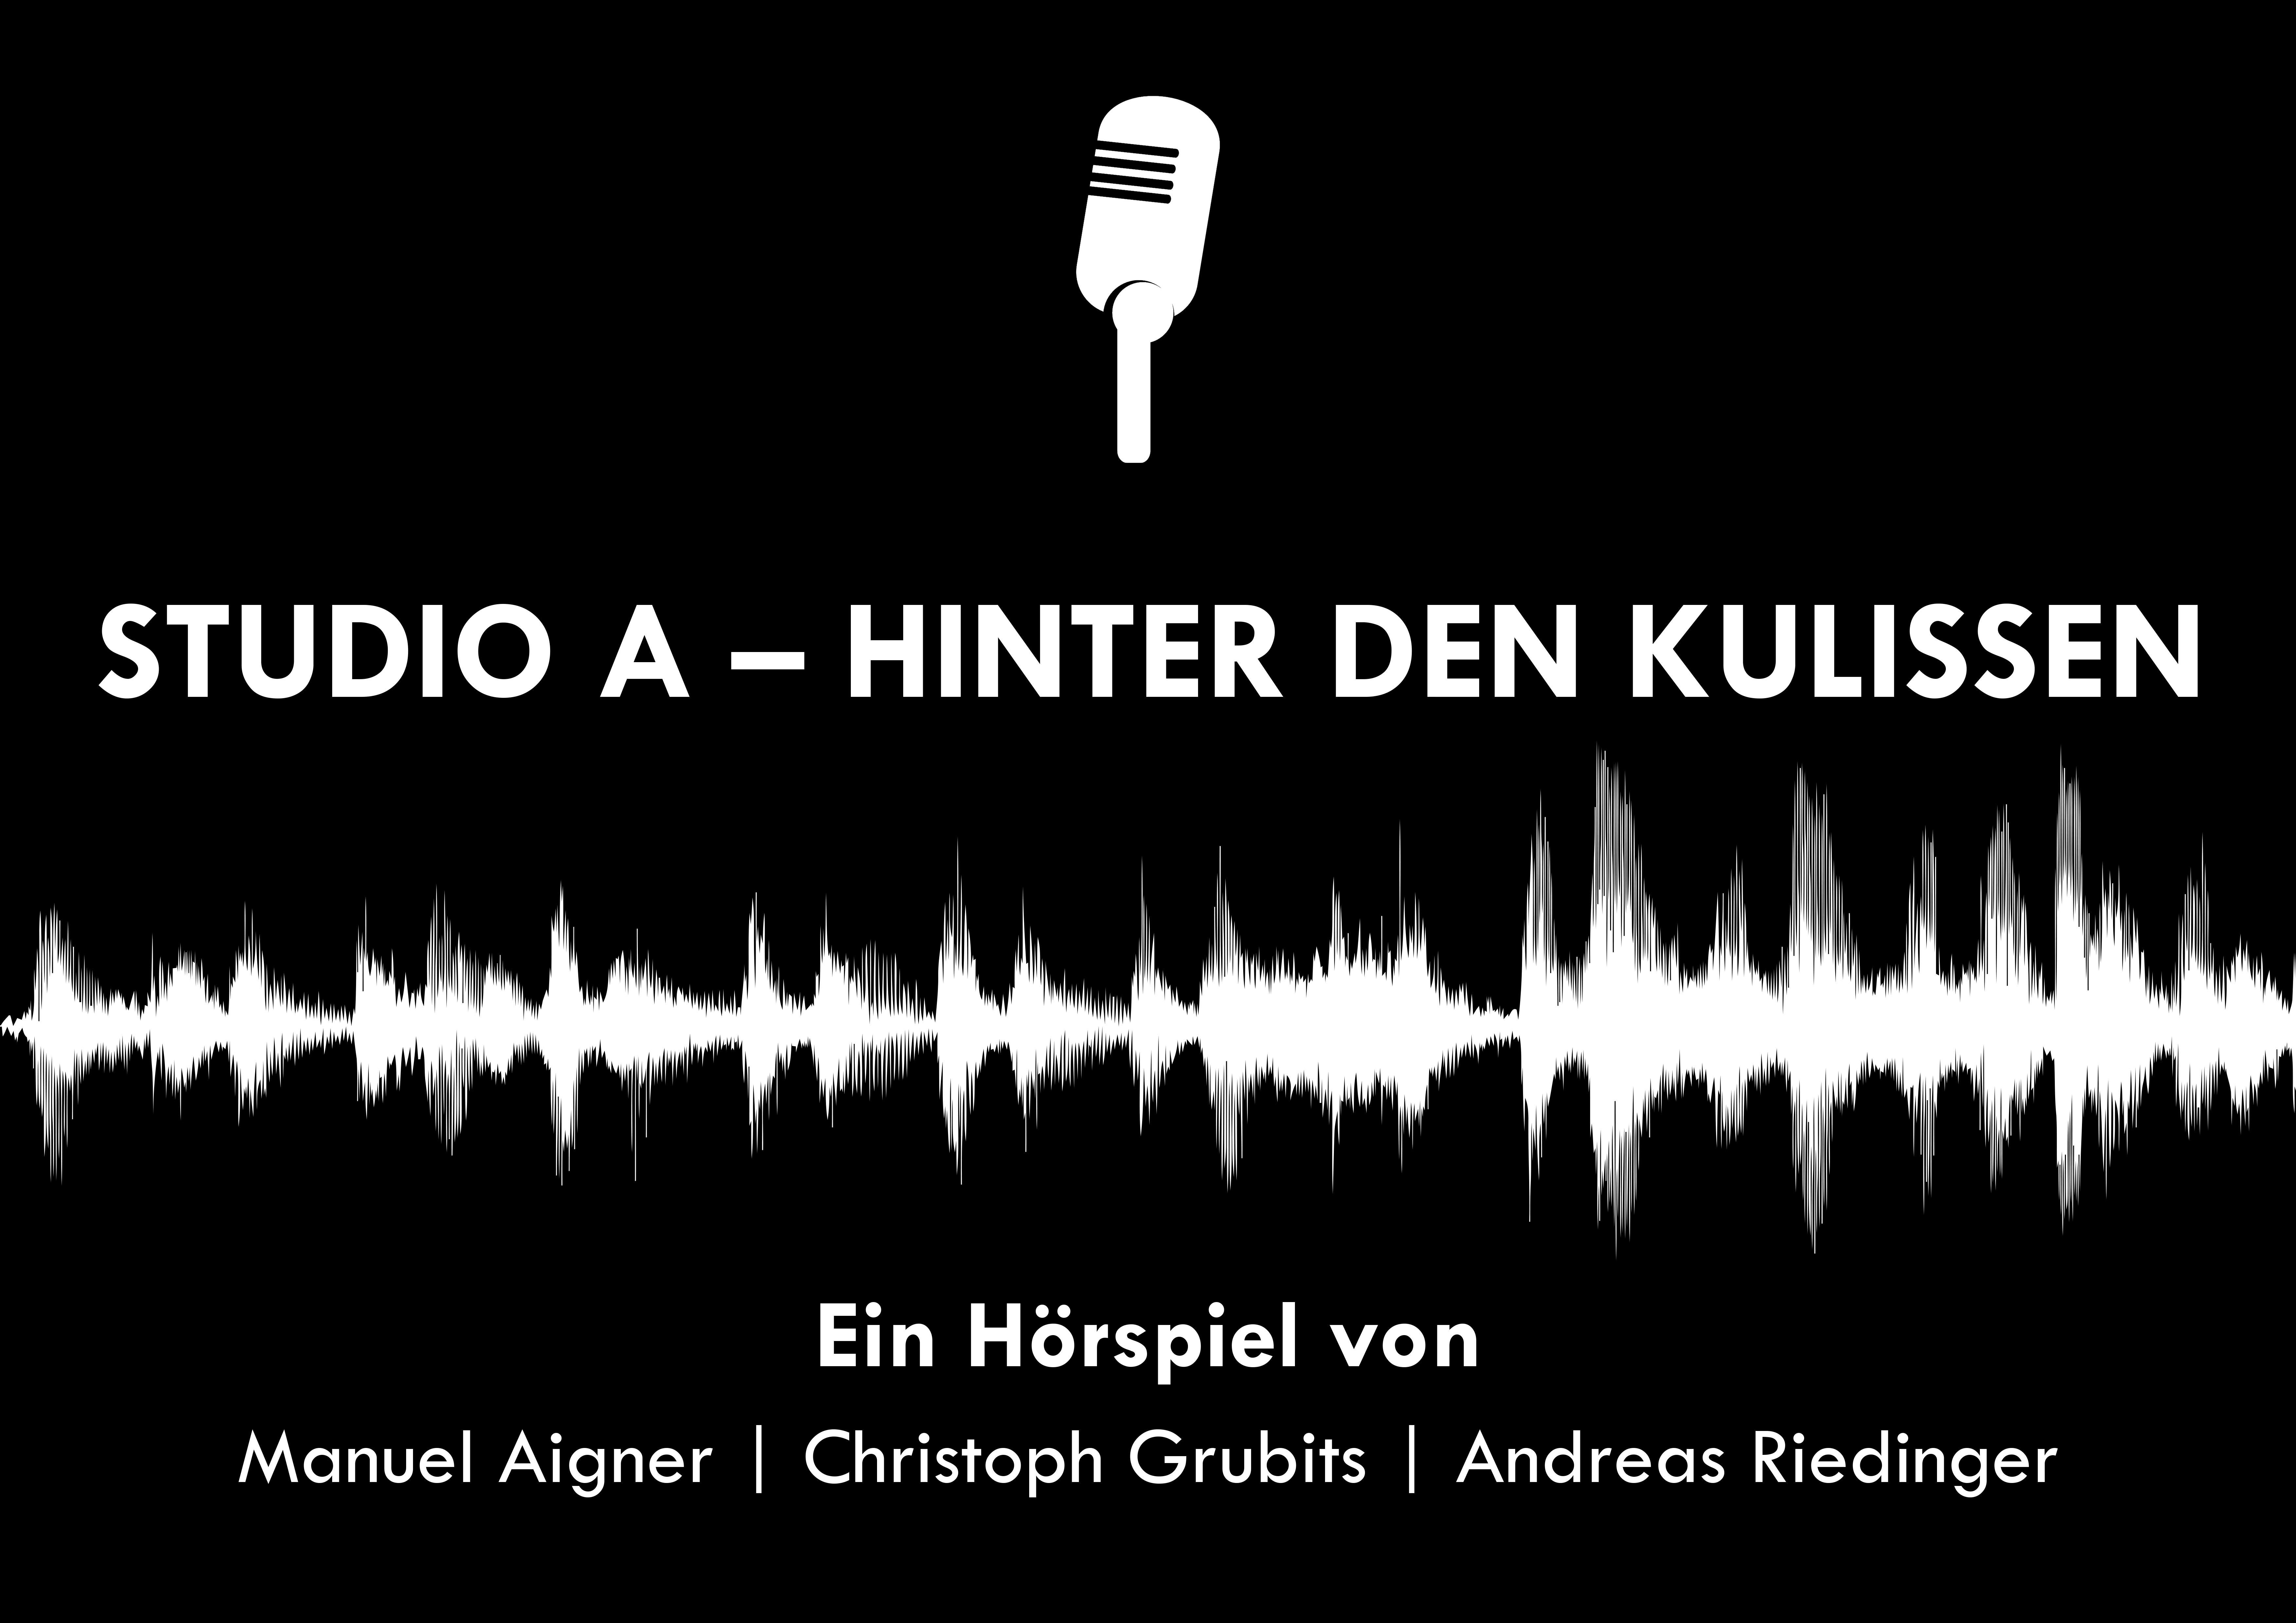 Hörspiel: Studio A – Hinter den Kulissen